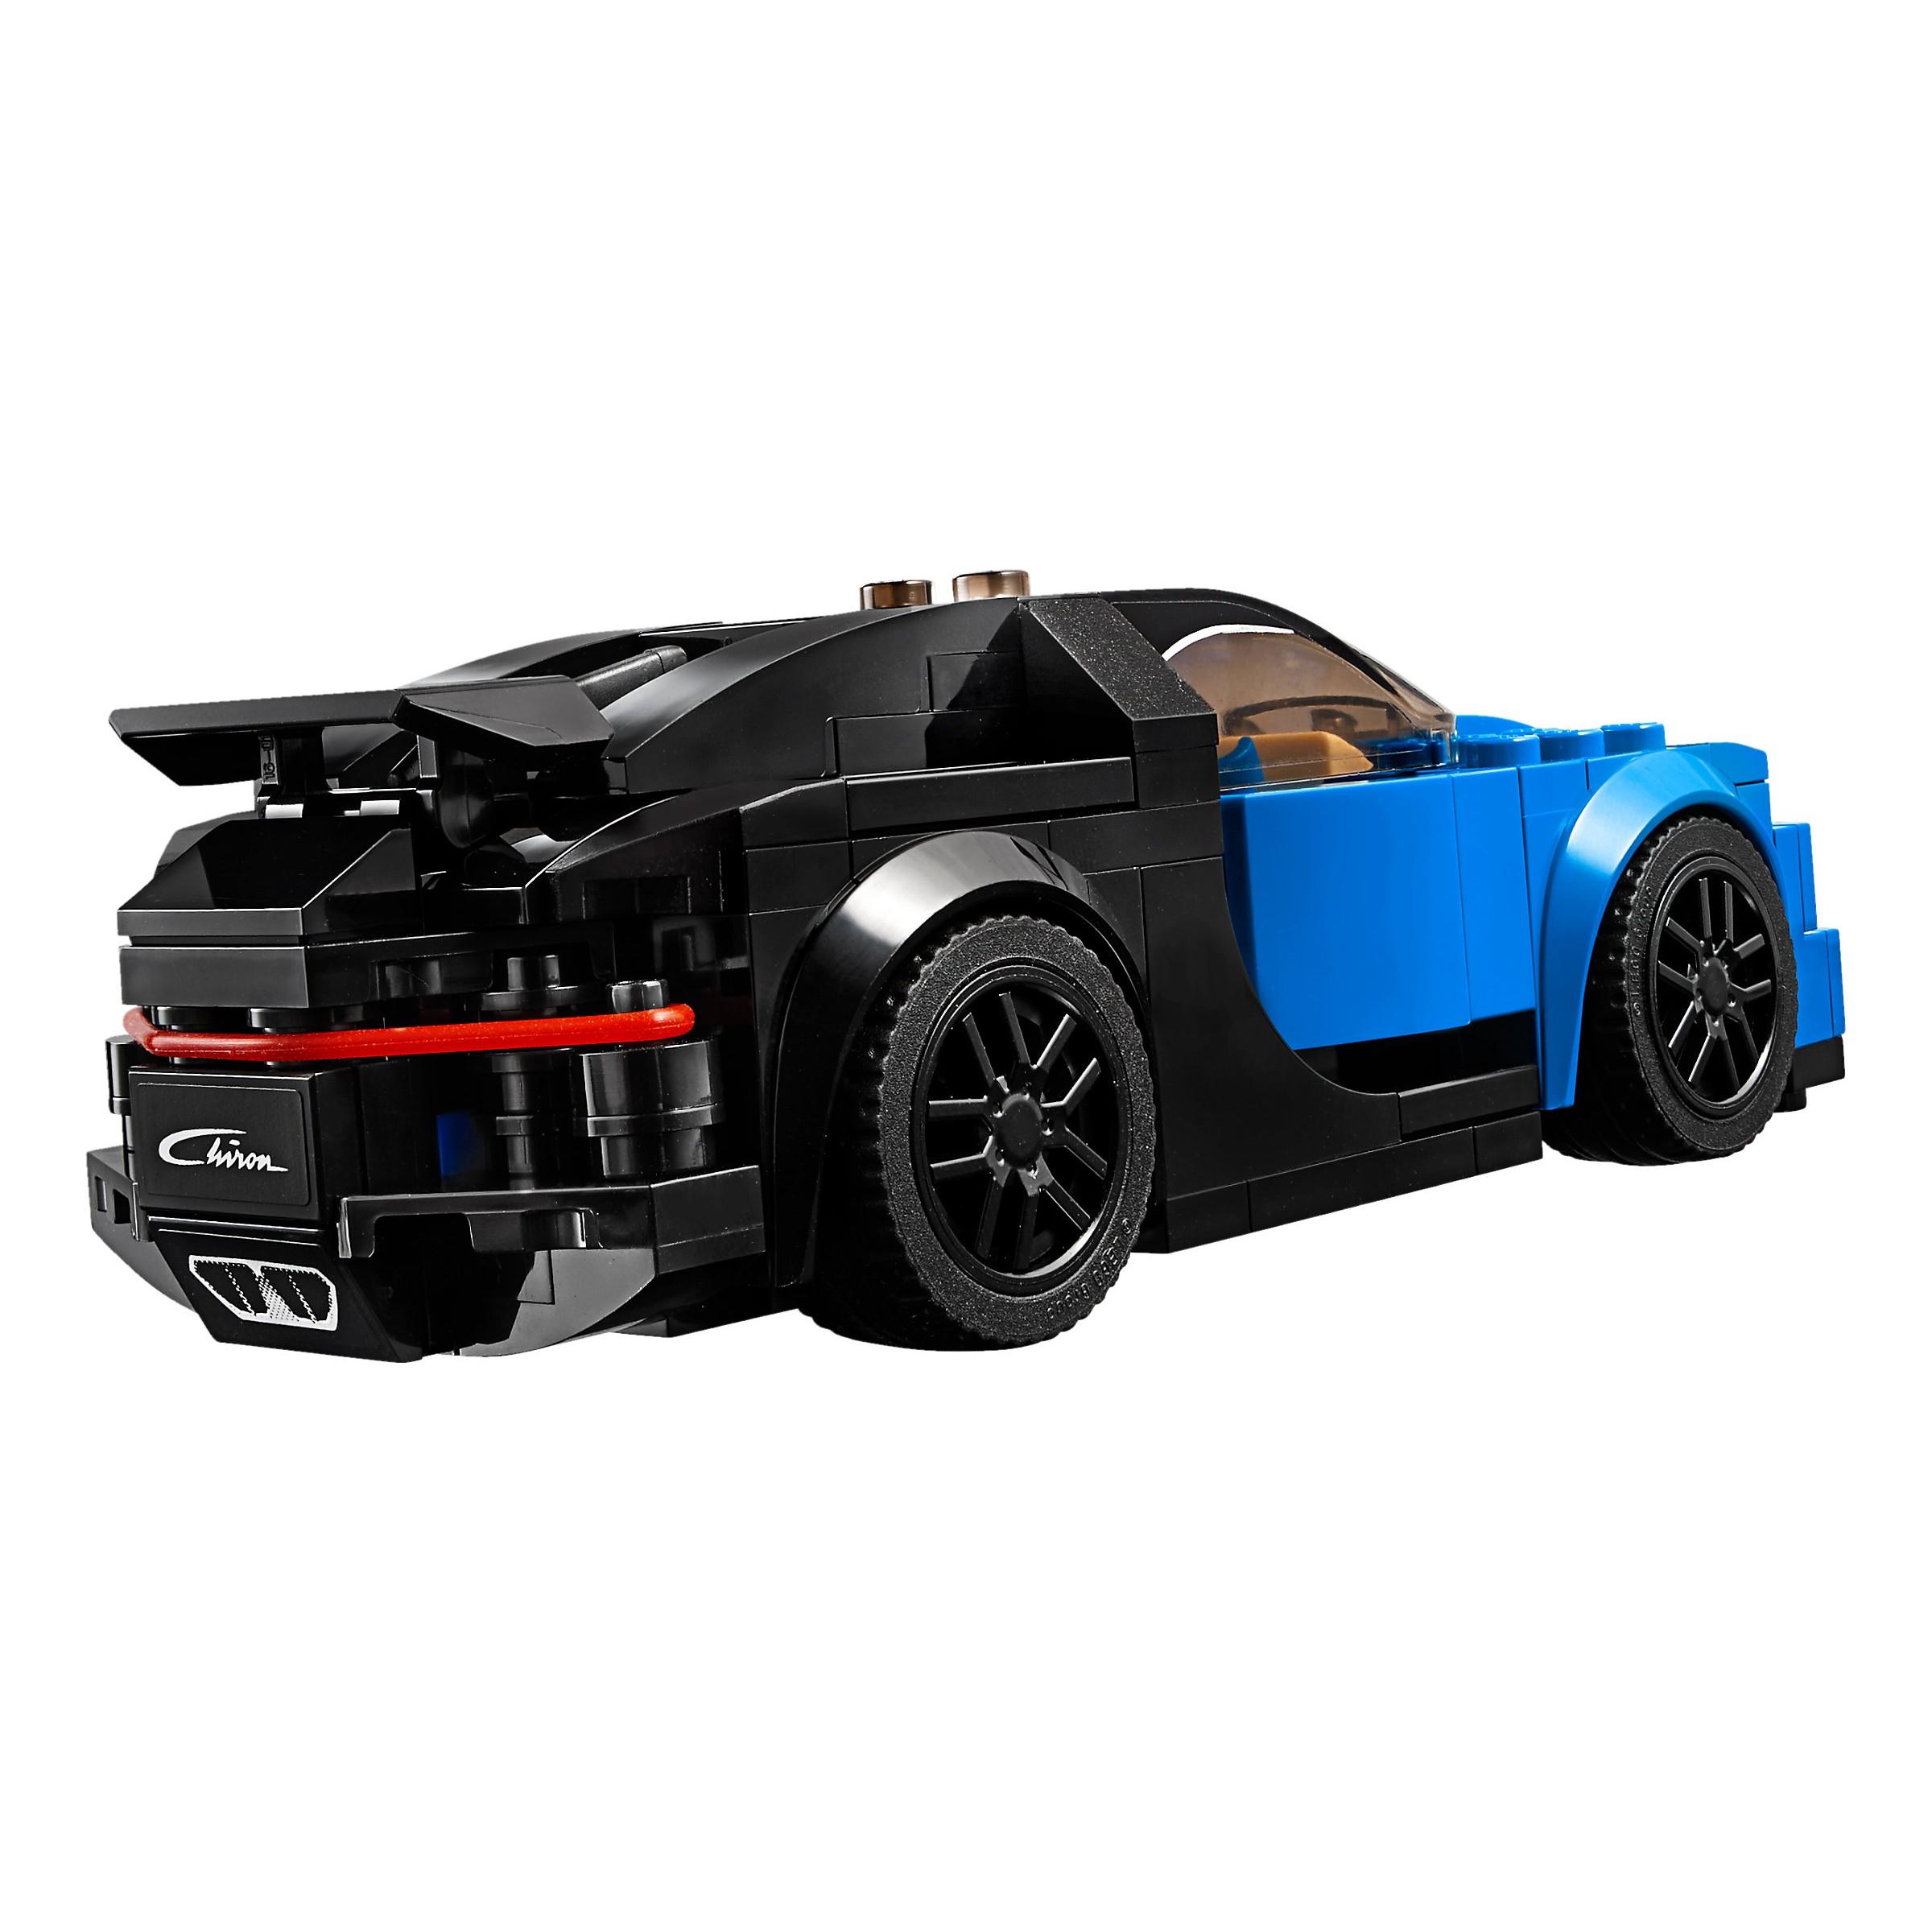 LEGO 75878 Speed Champions Bugatti Chiron at Hobby Warehouse